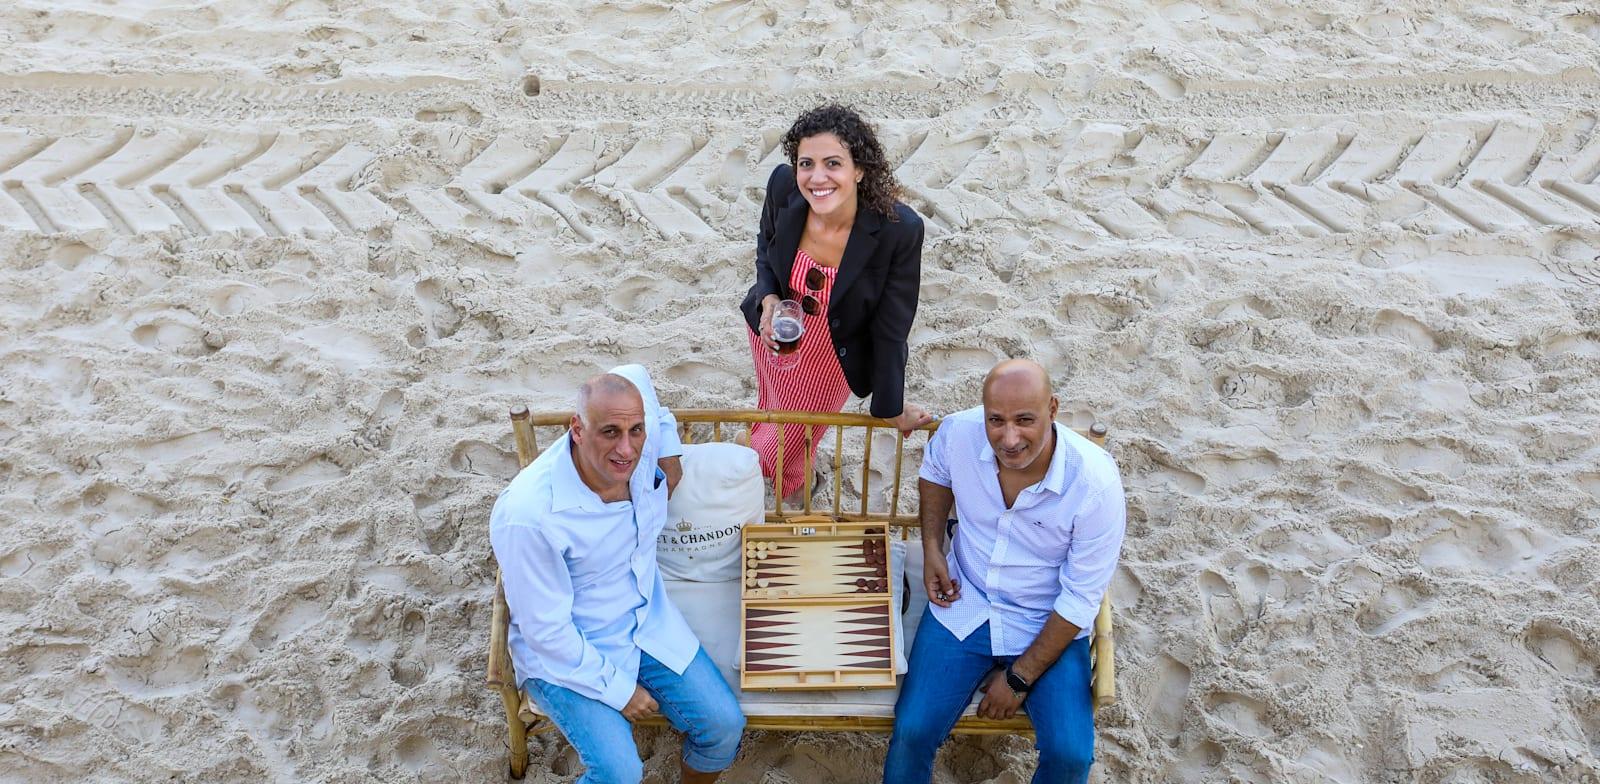 Beach Bum founders Photo: Shlomi Yosef